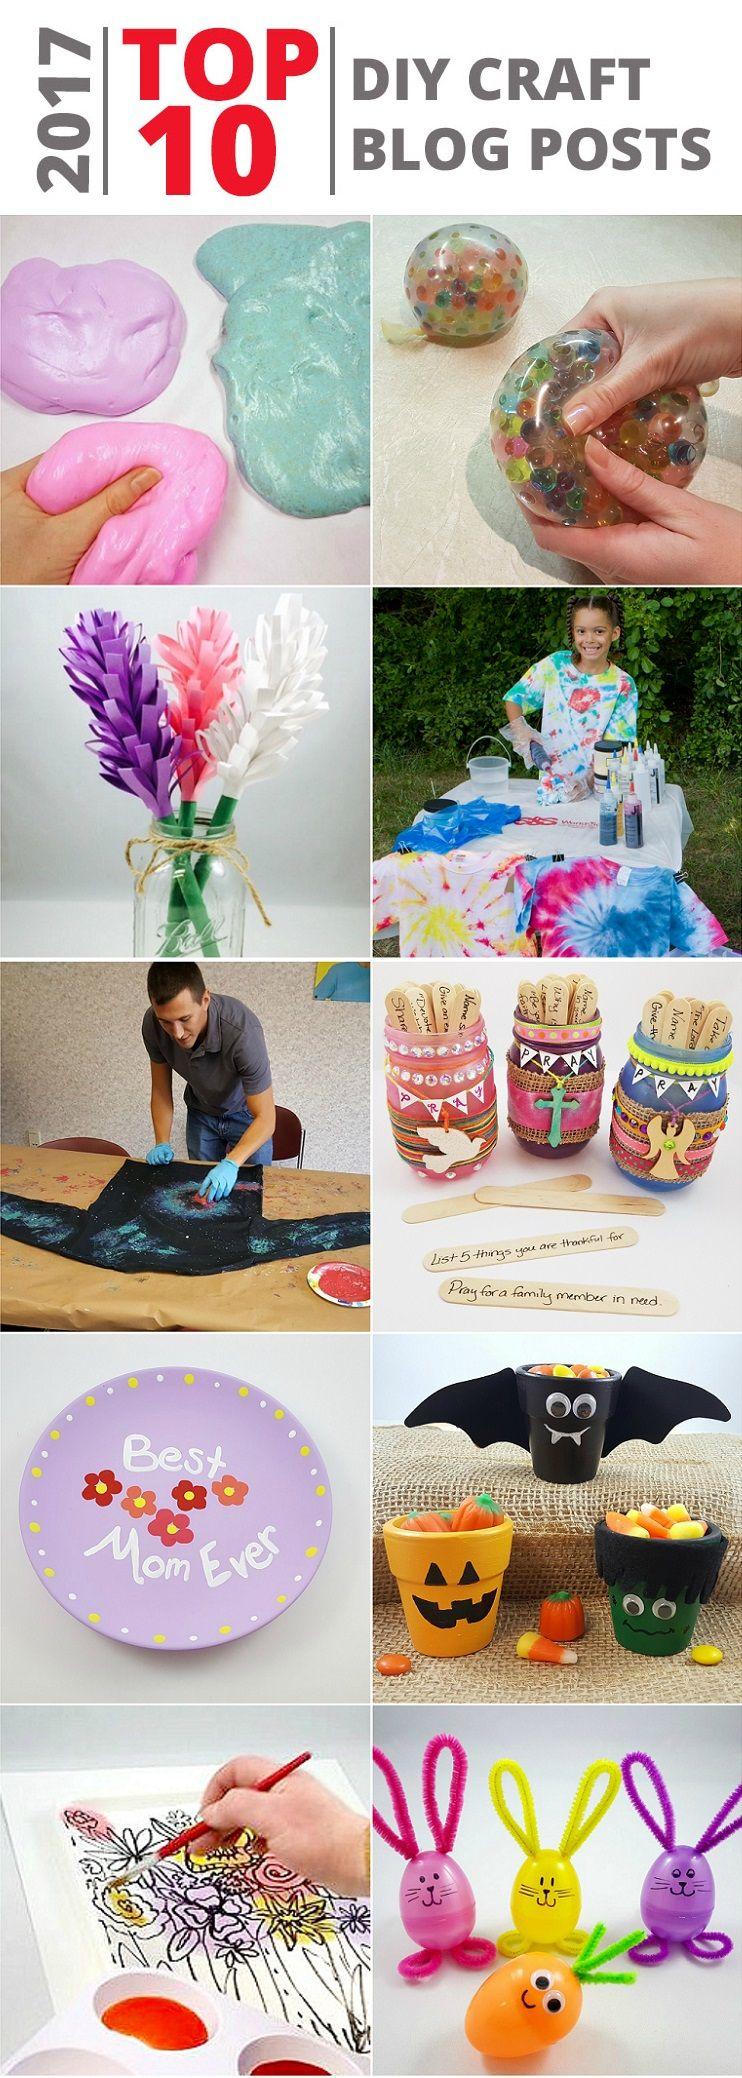 craft diy posts ssww crafts